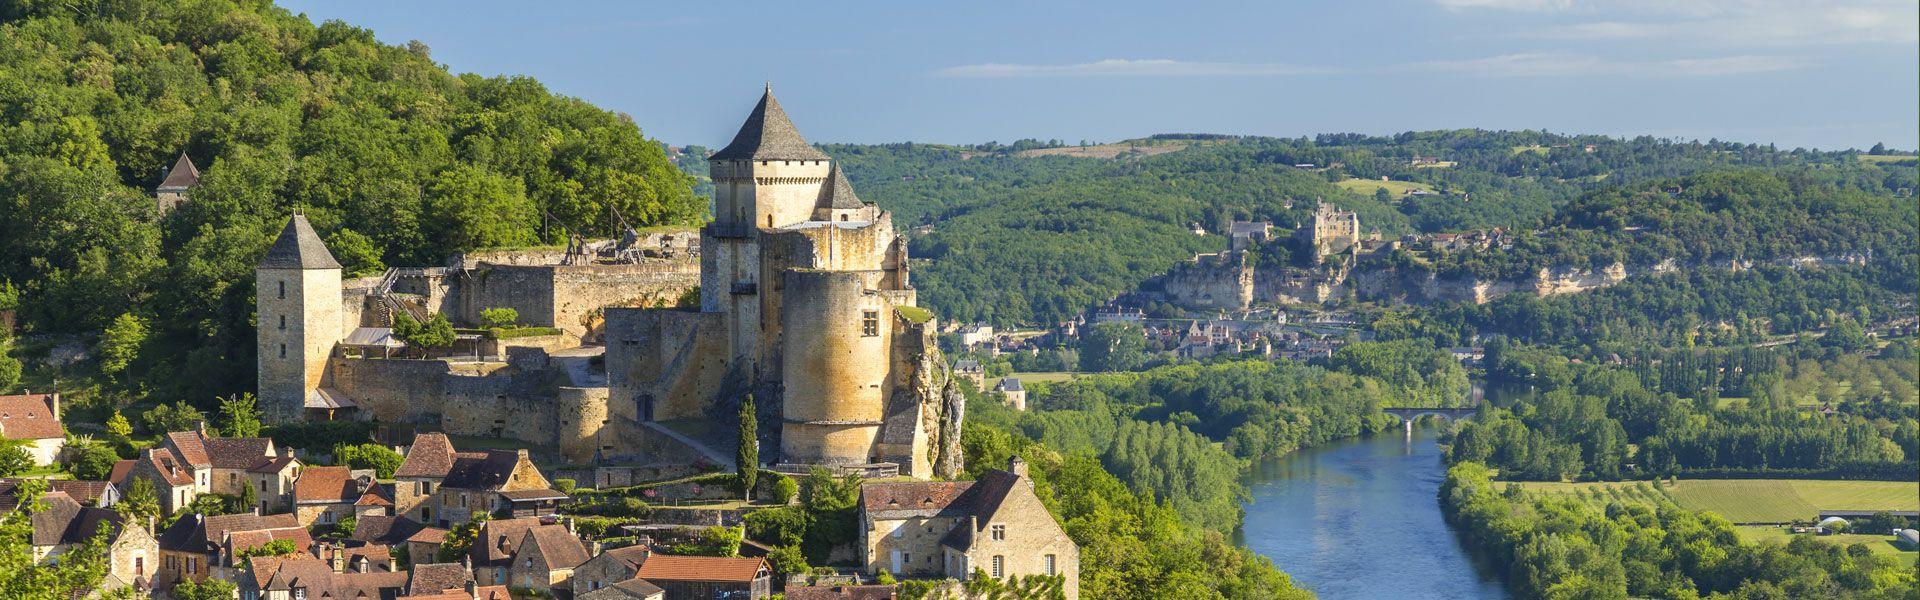 Camping Burg Castelnaud